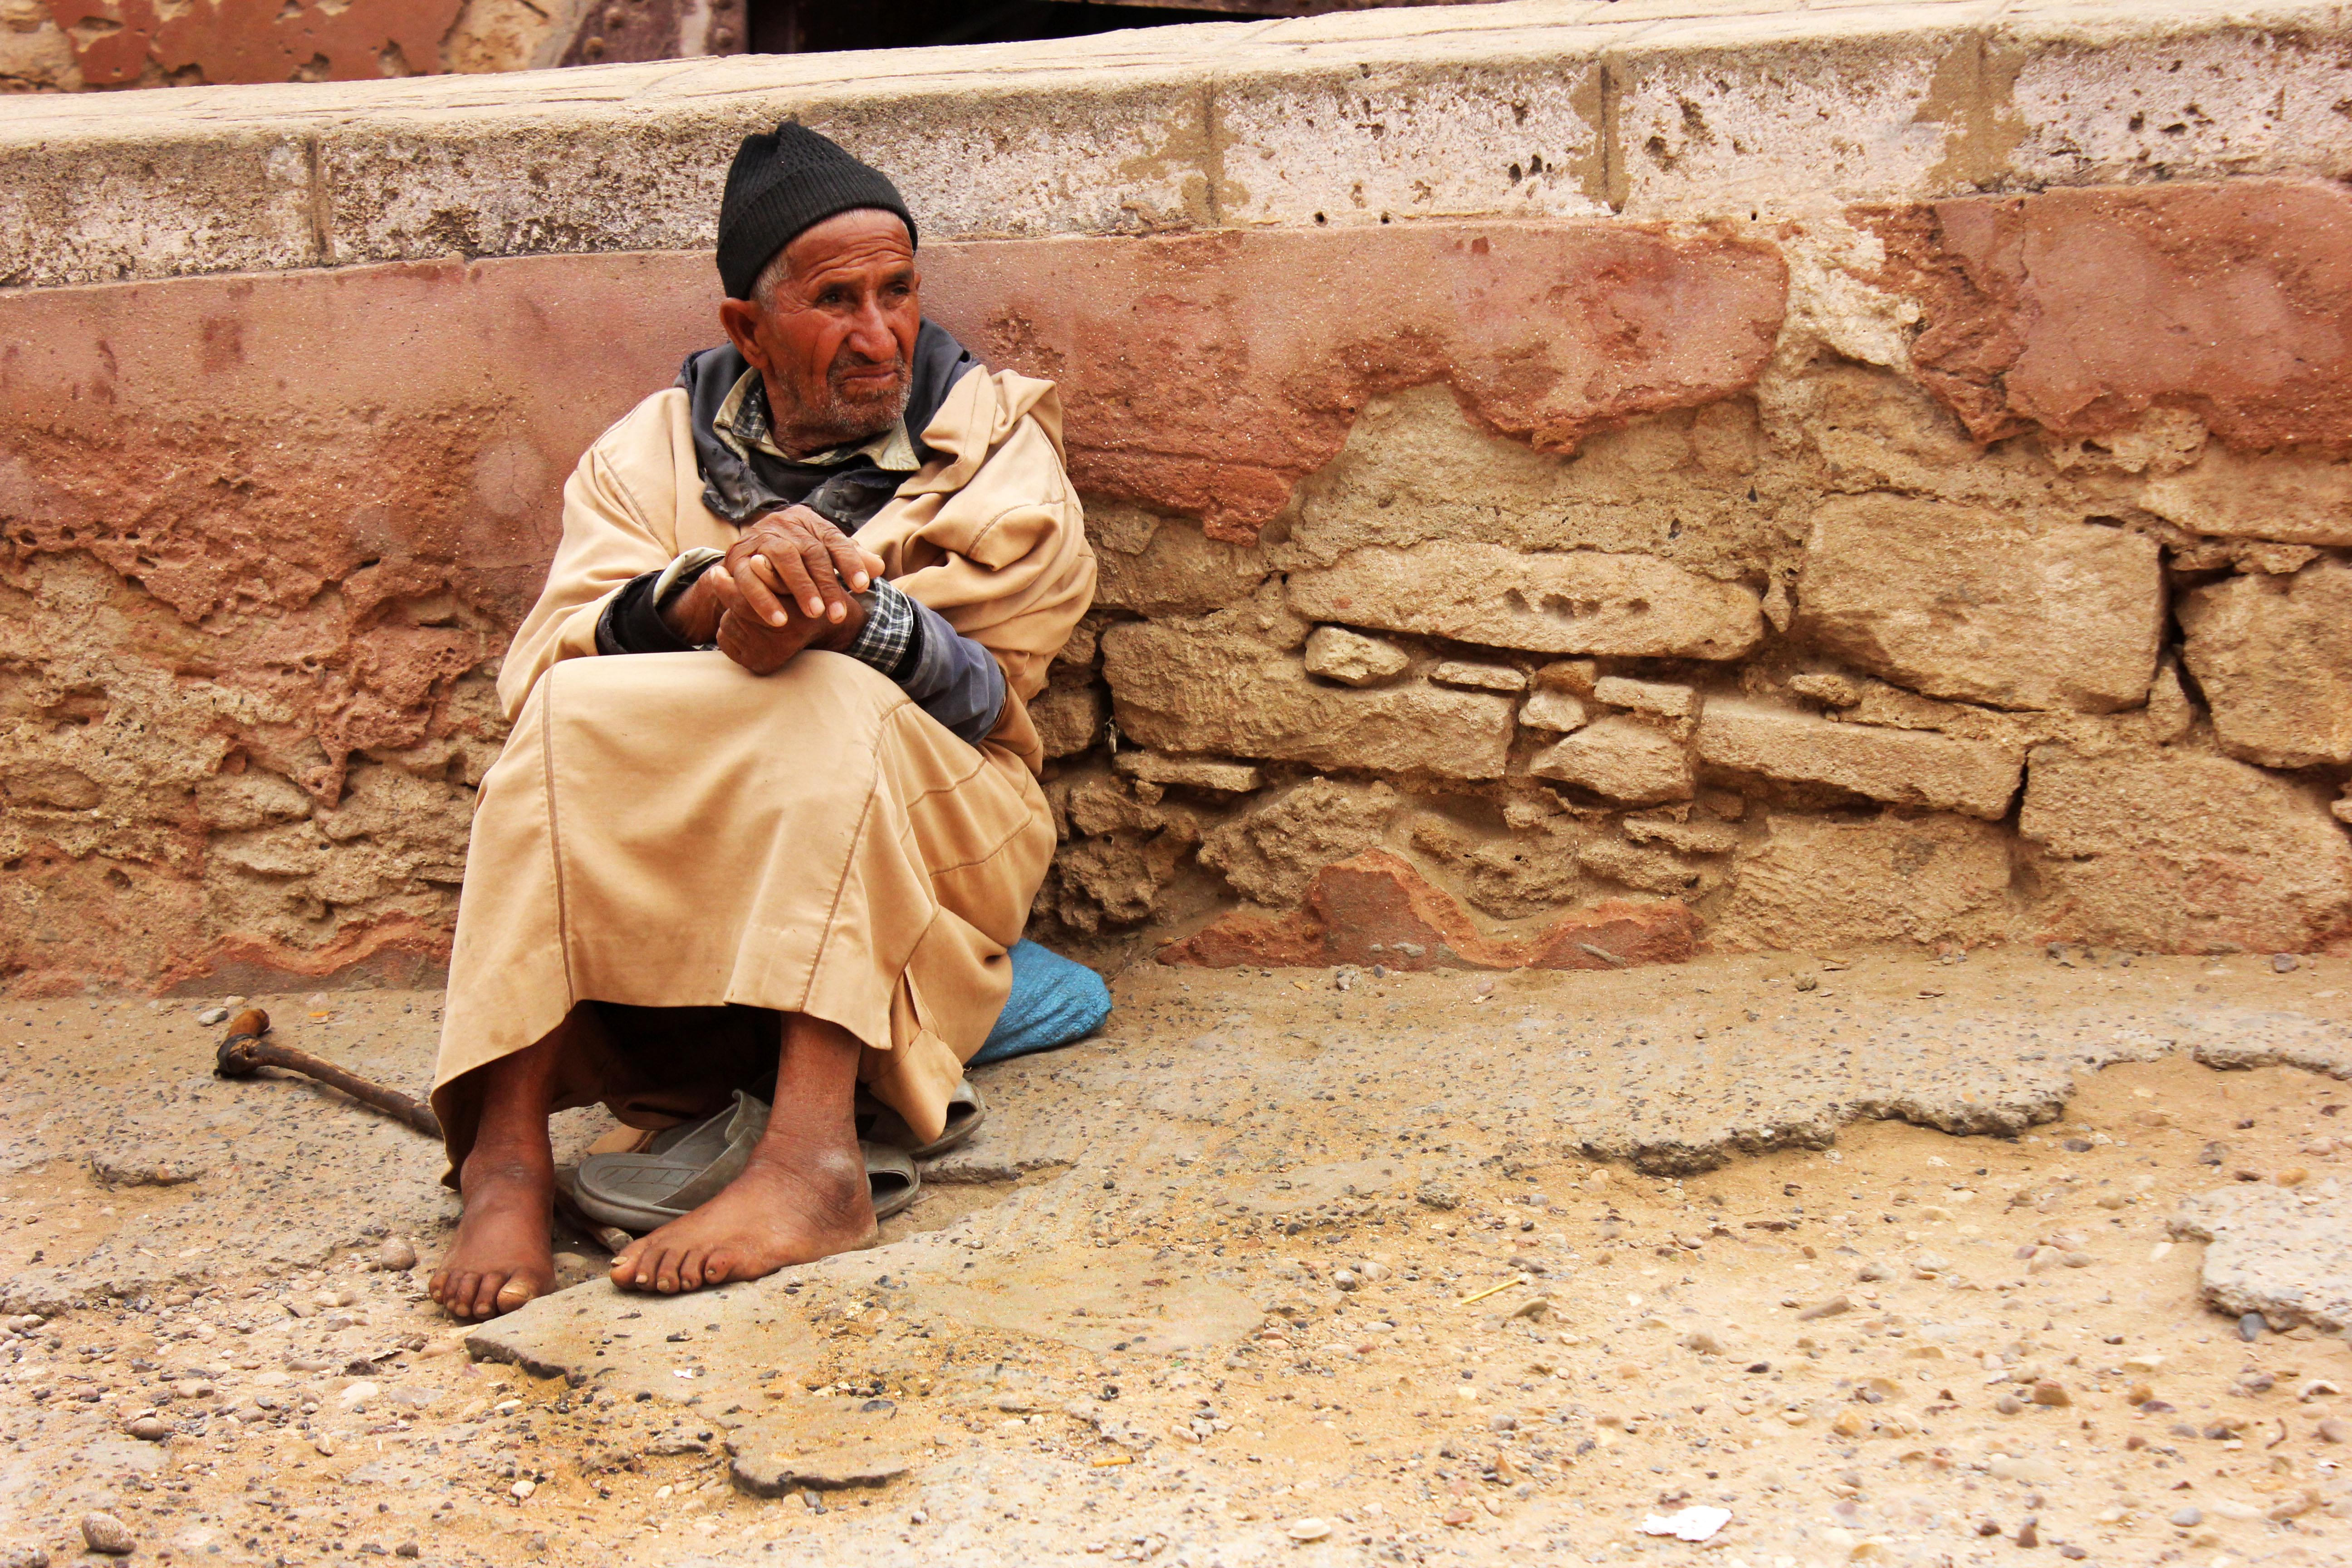 Eussaouira Bare Feet (Morocco, 2013)